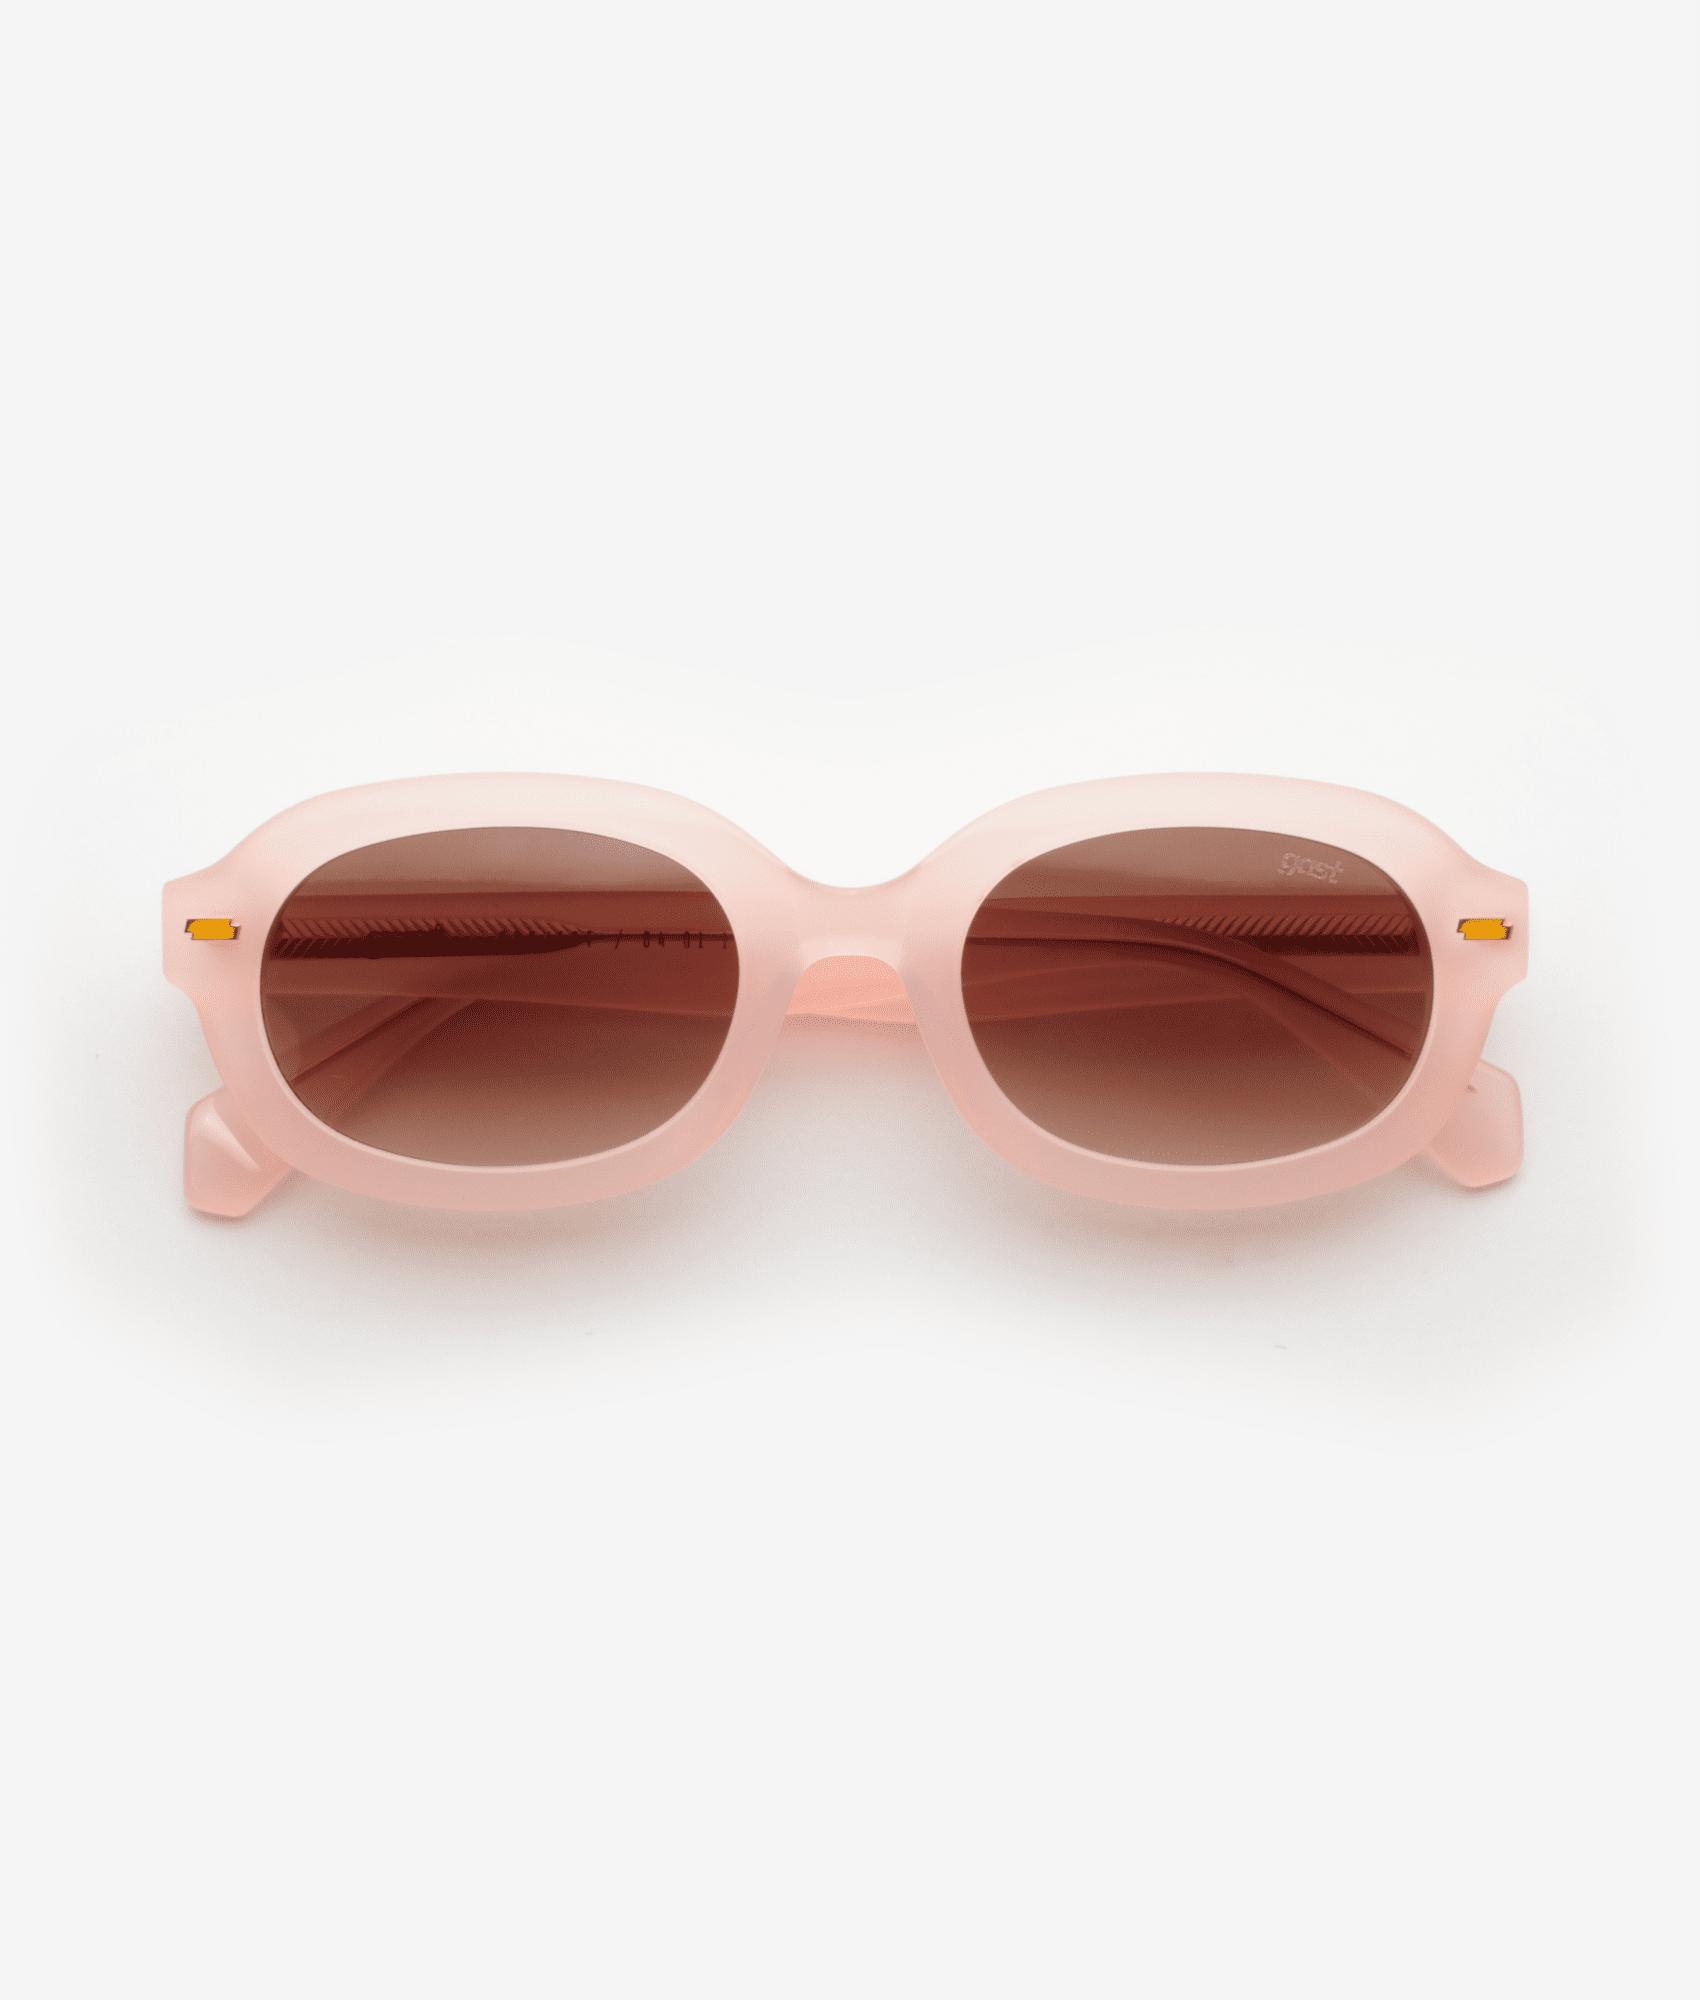 NSFK Pink Gast Sunglasses